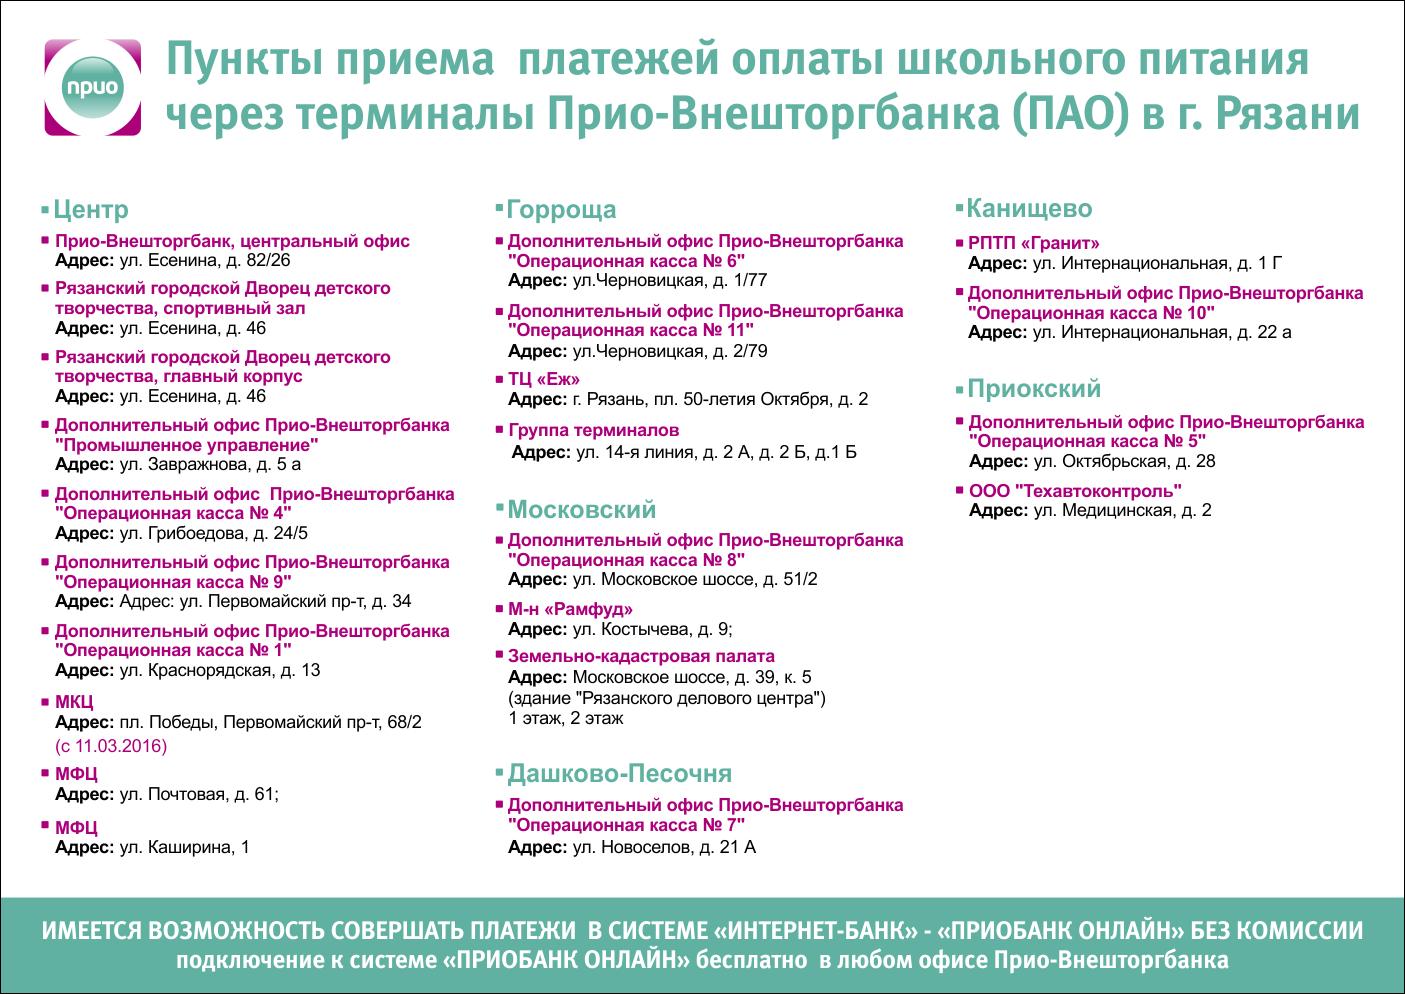 ПРИО ВНЕШТОРГБАНК_Адреса терминалов.jpg